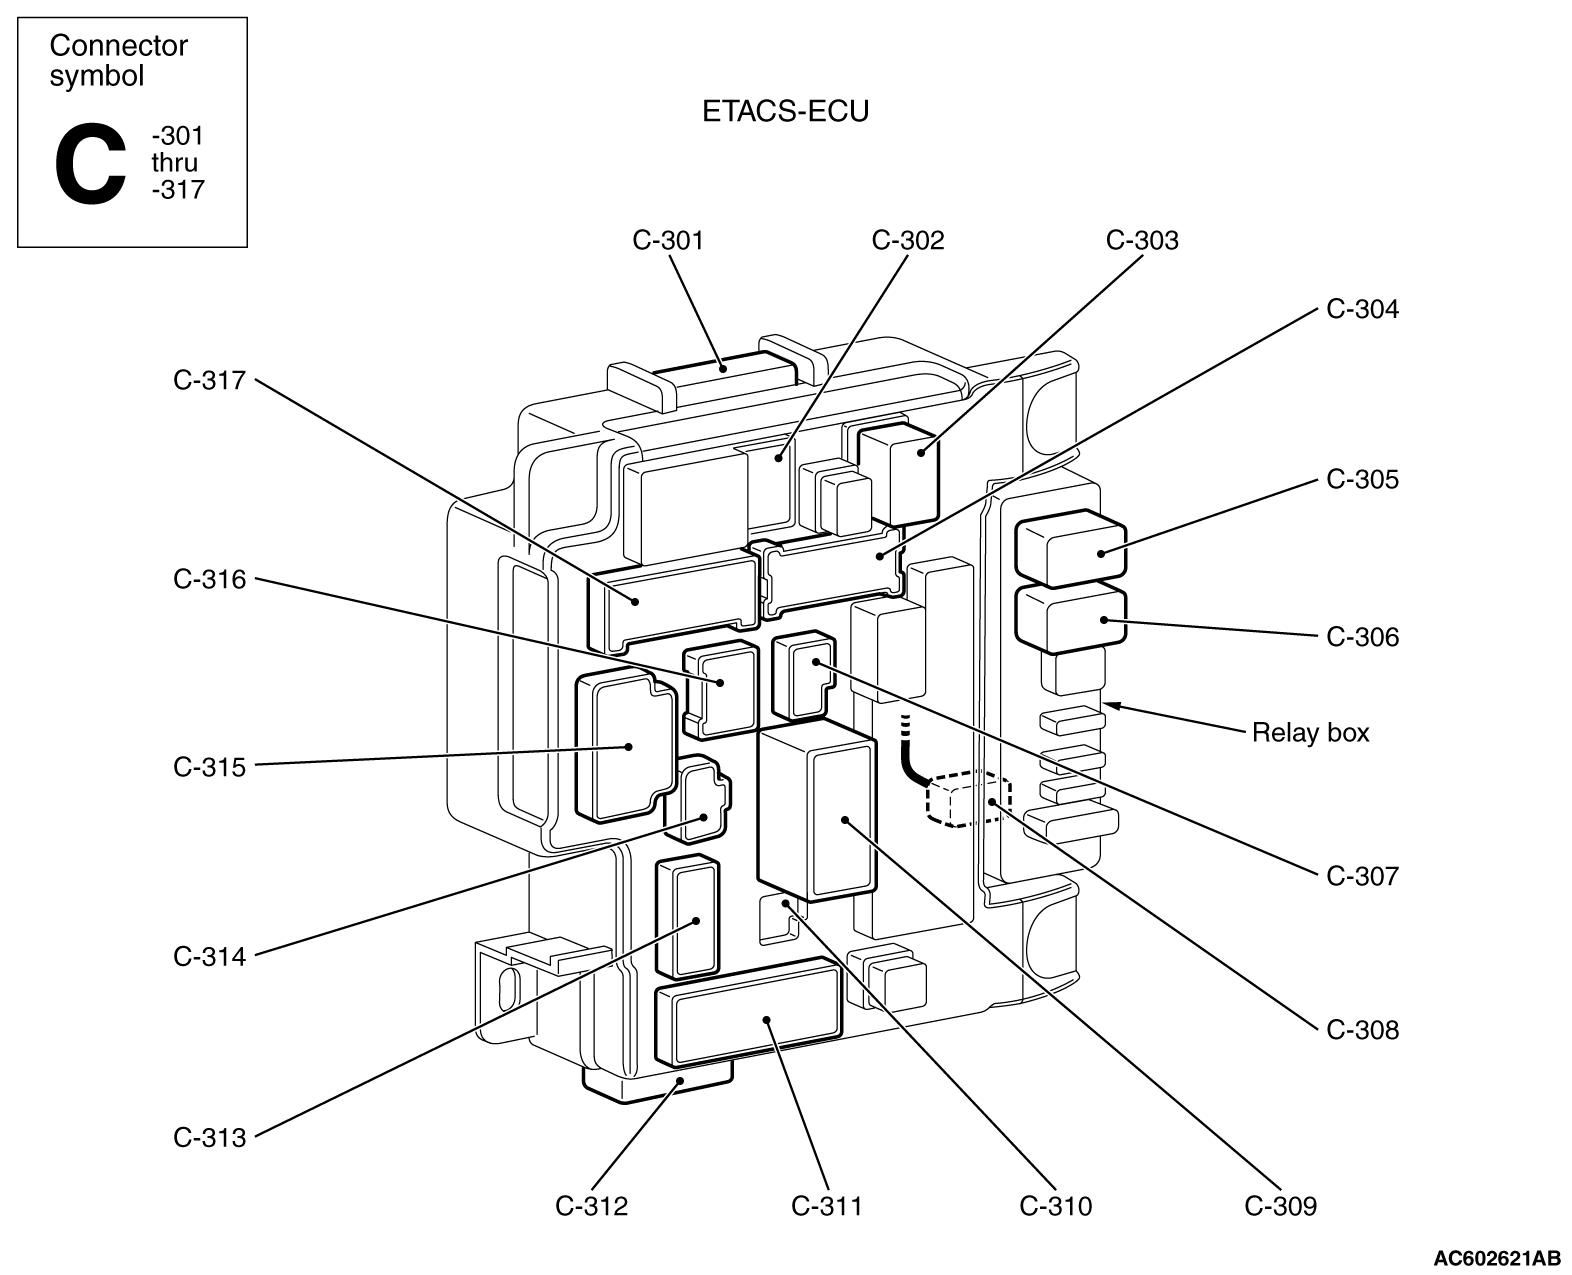 fuse box 2005 infiniti g35 yg 5644  pump wiring diagram additionally 2005 nissan altima fuse  yg 5644  pump wiring diagram